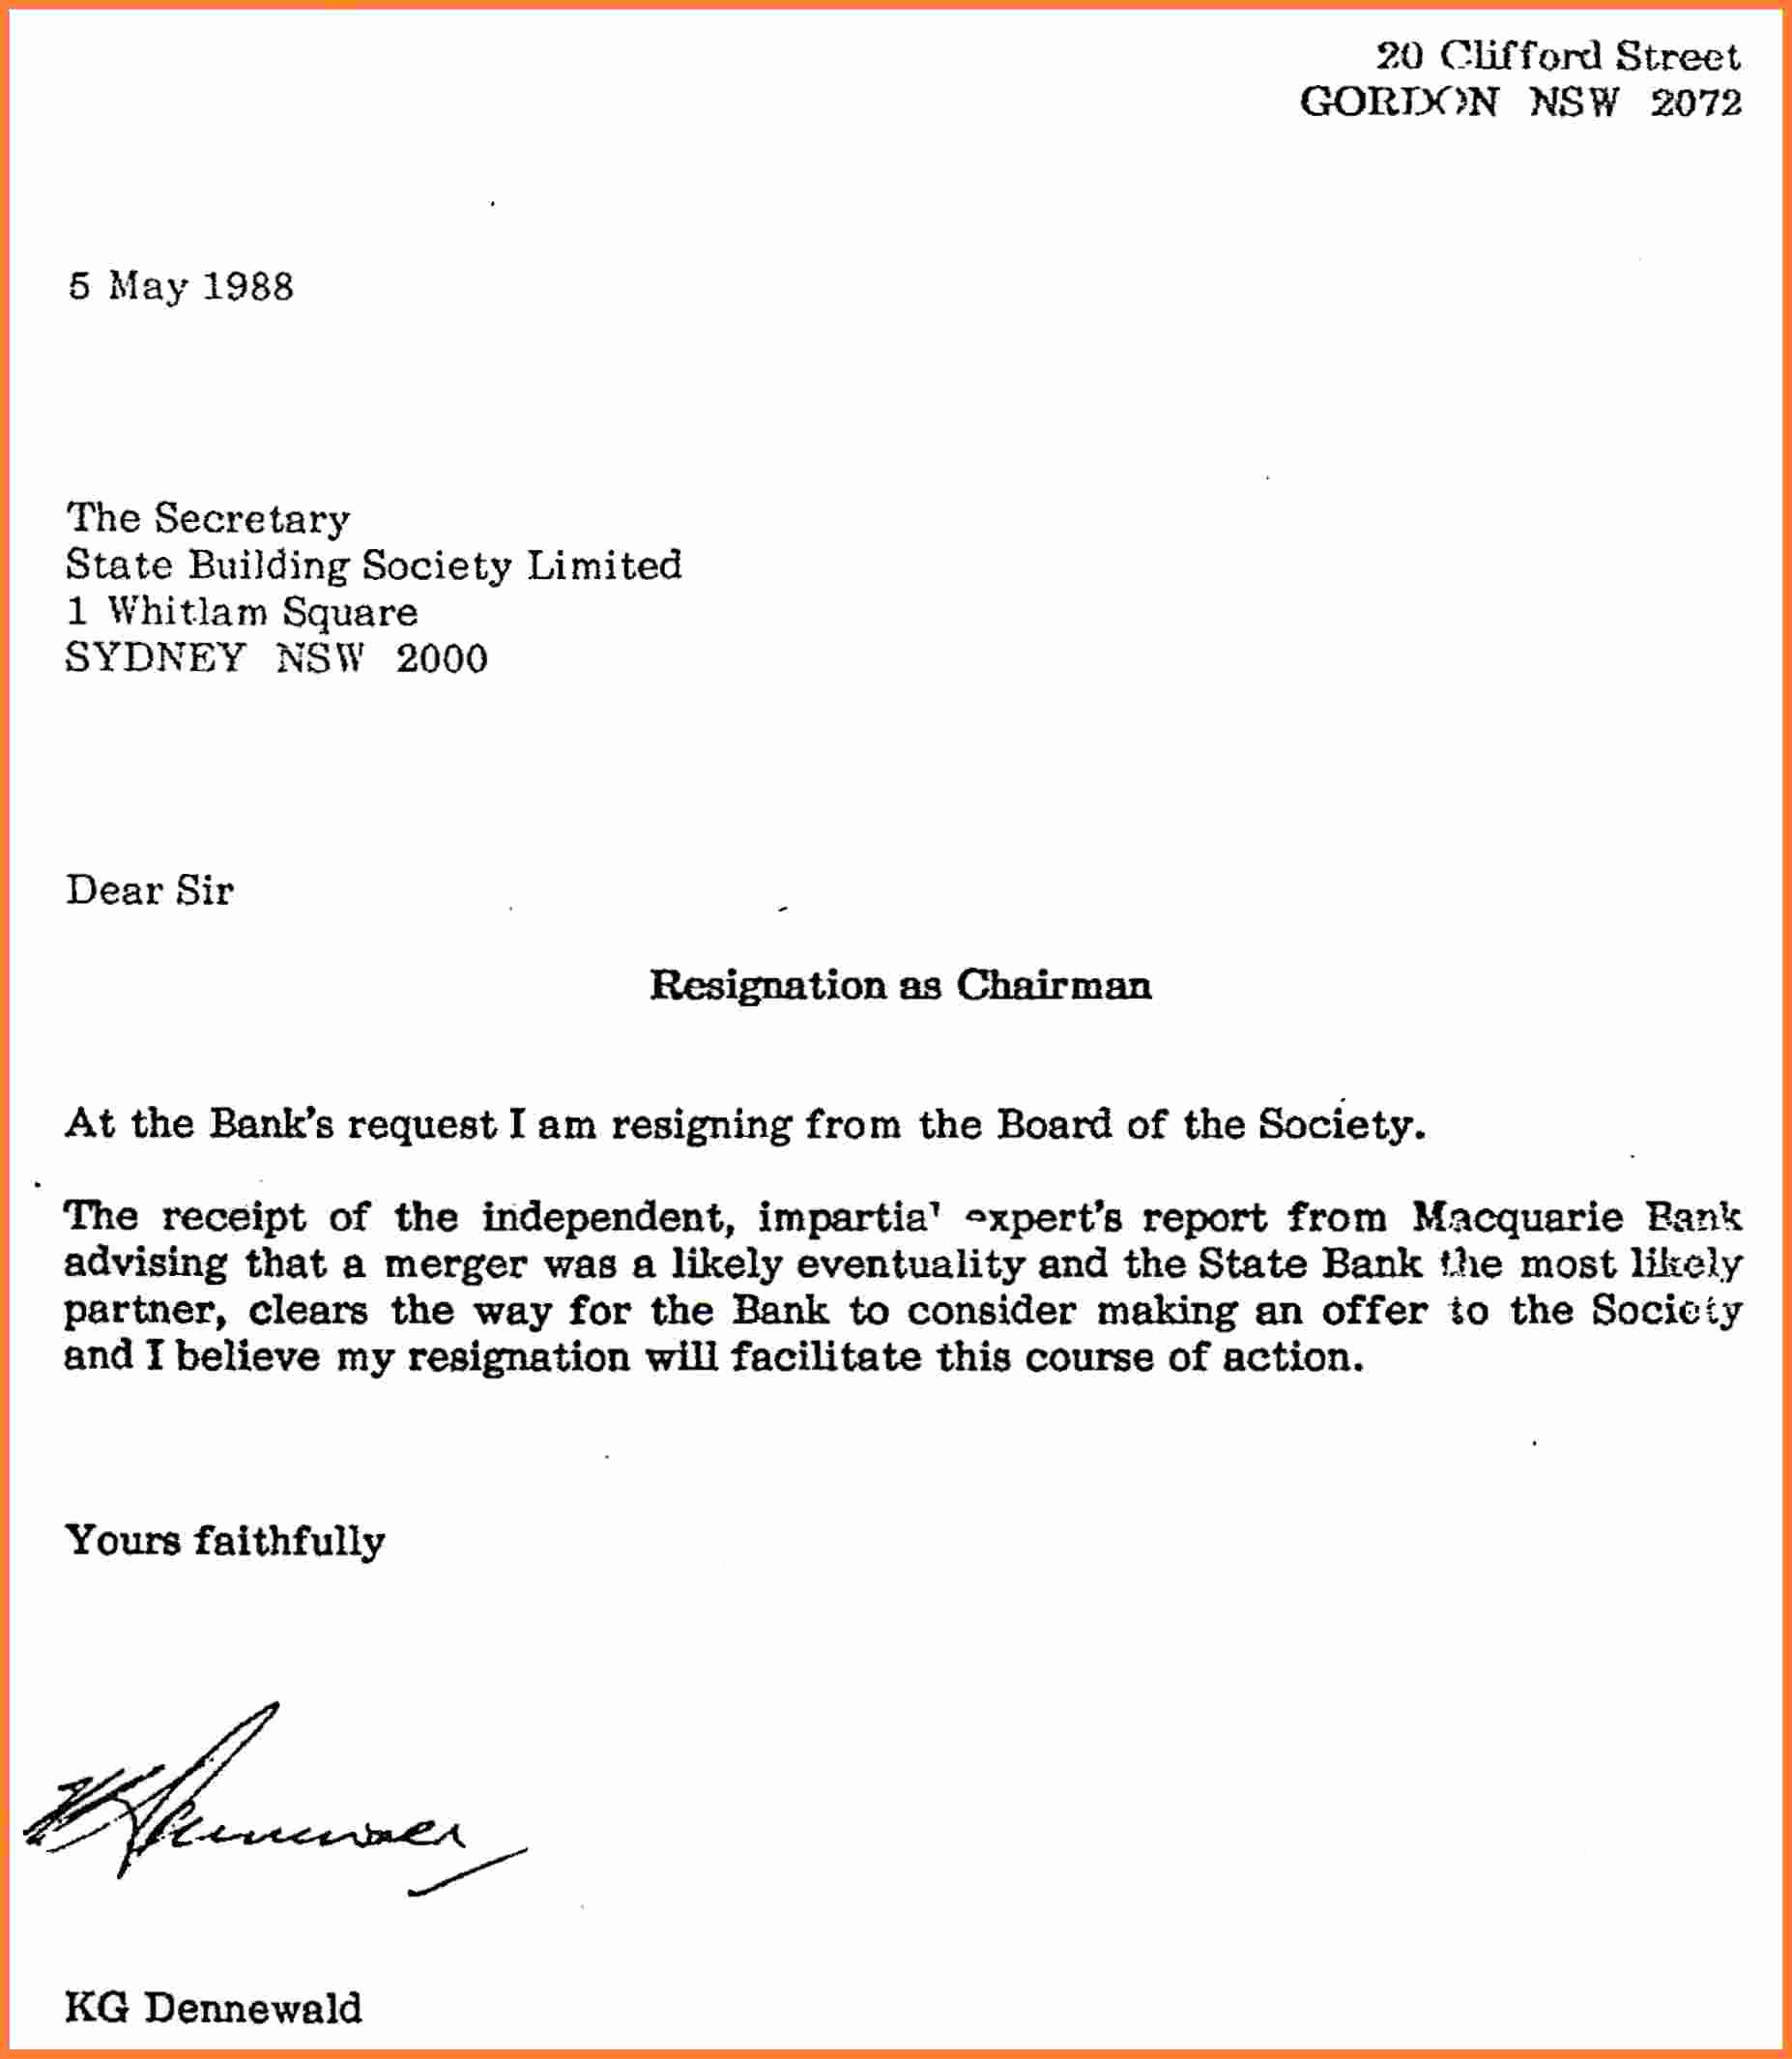 Professional Resignation Letter Sample Elegant 11 Professional Letter Of Resignation